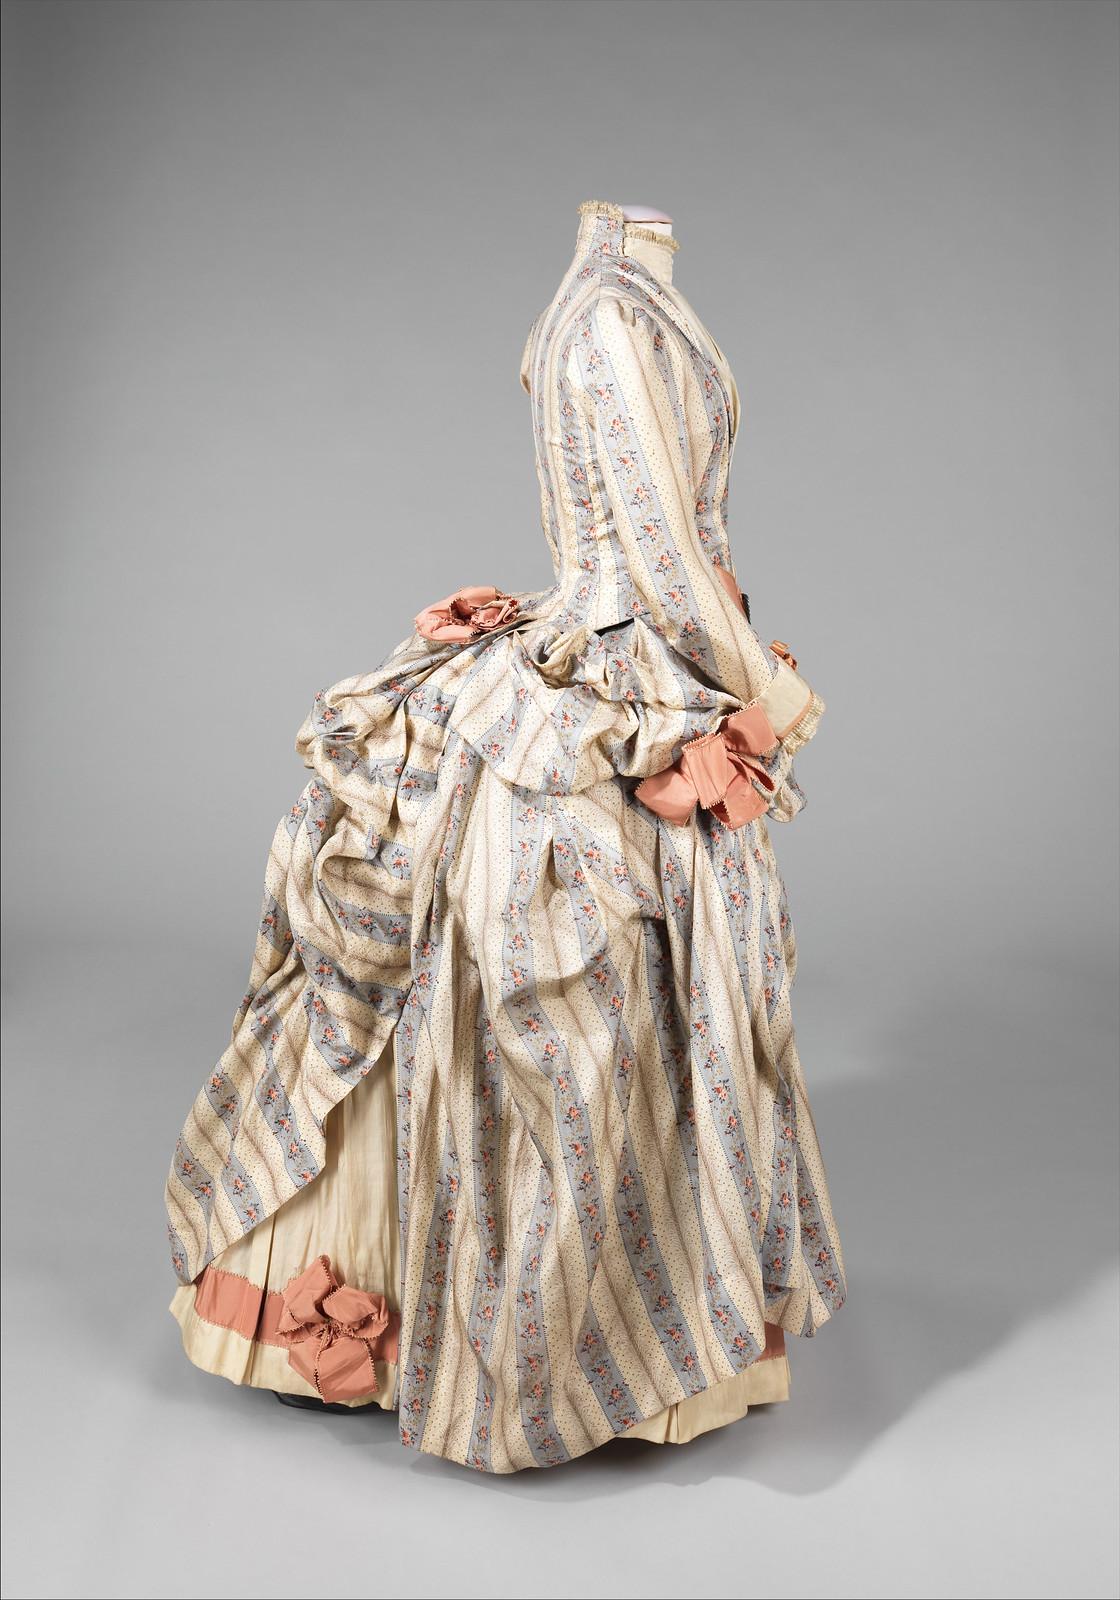 1885. American. Silk, rhinestones, metal. metmuseum